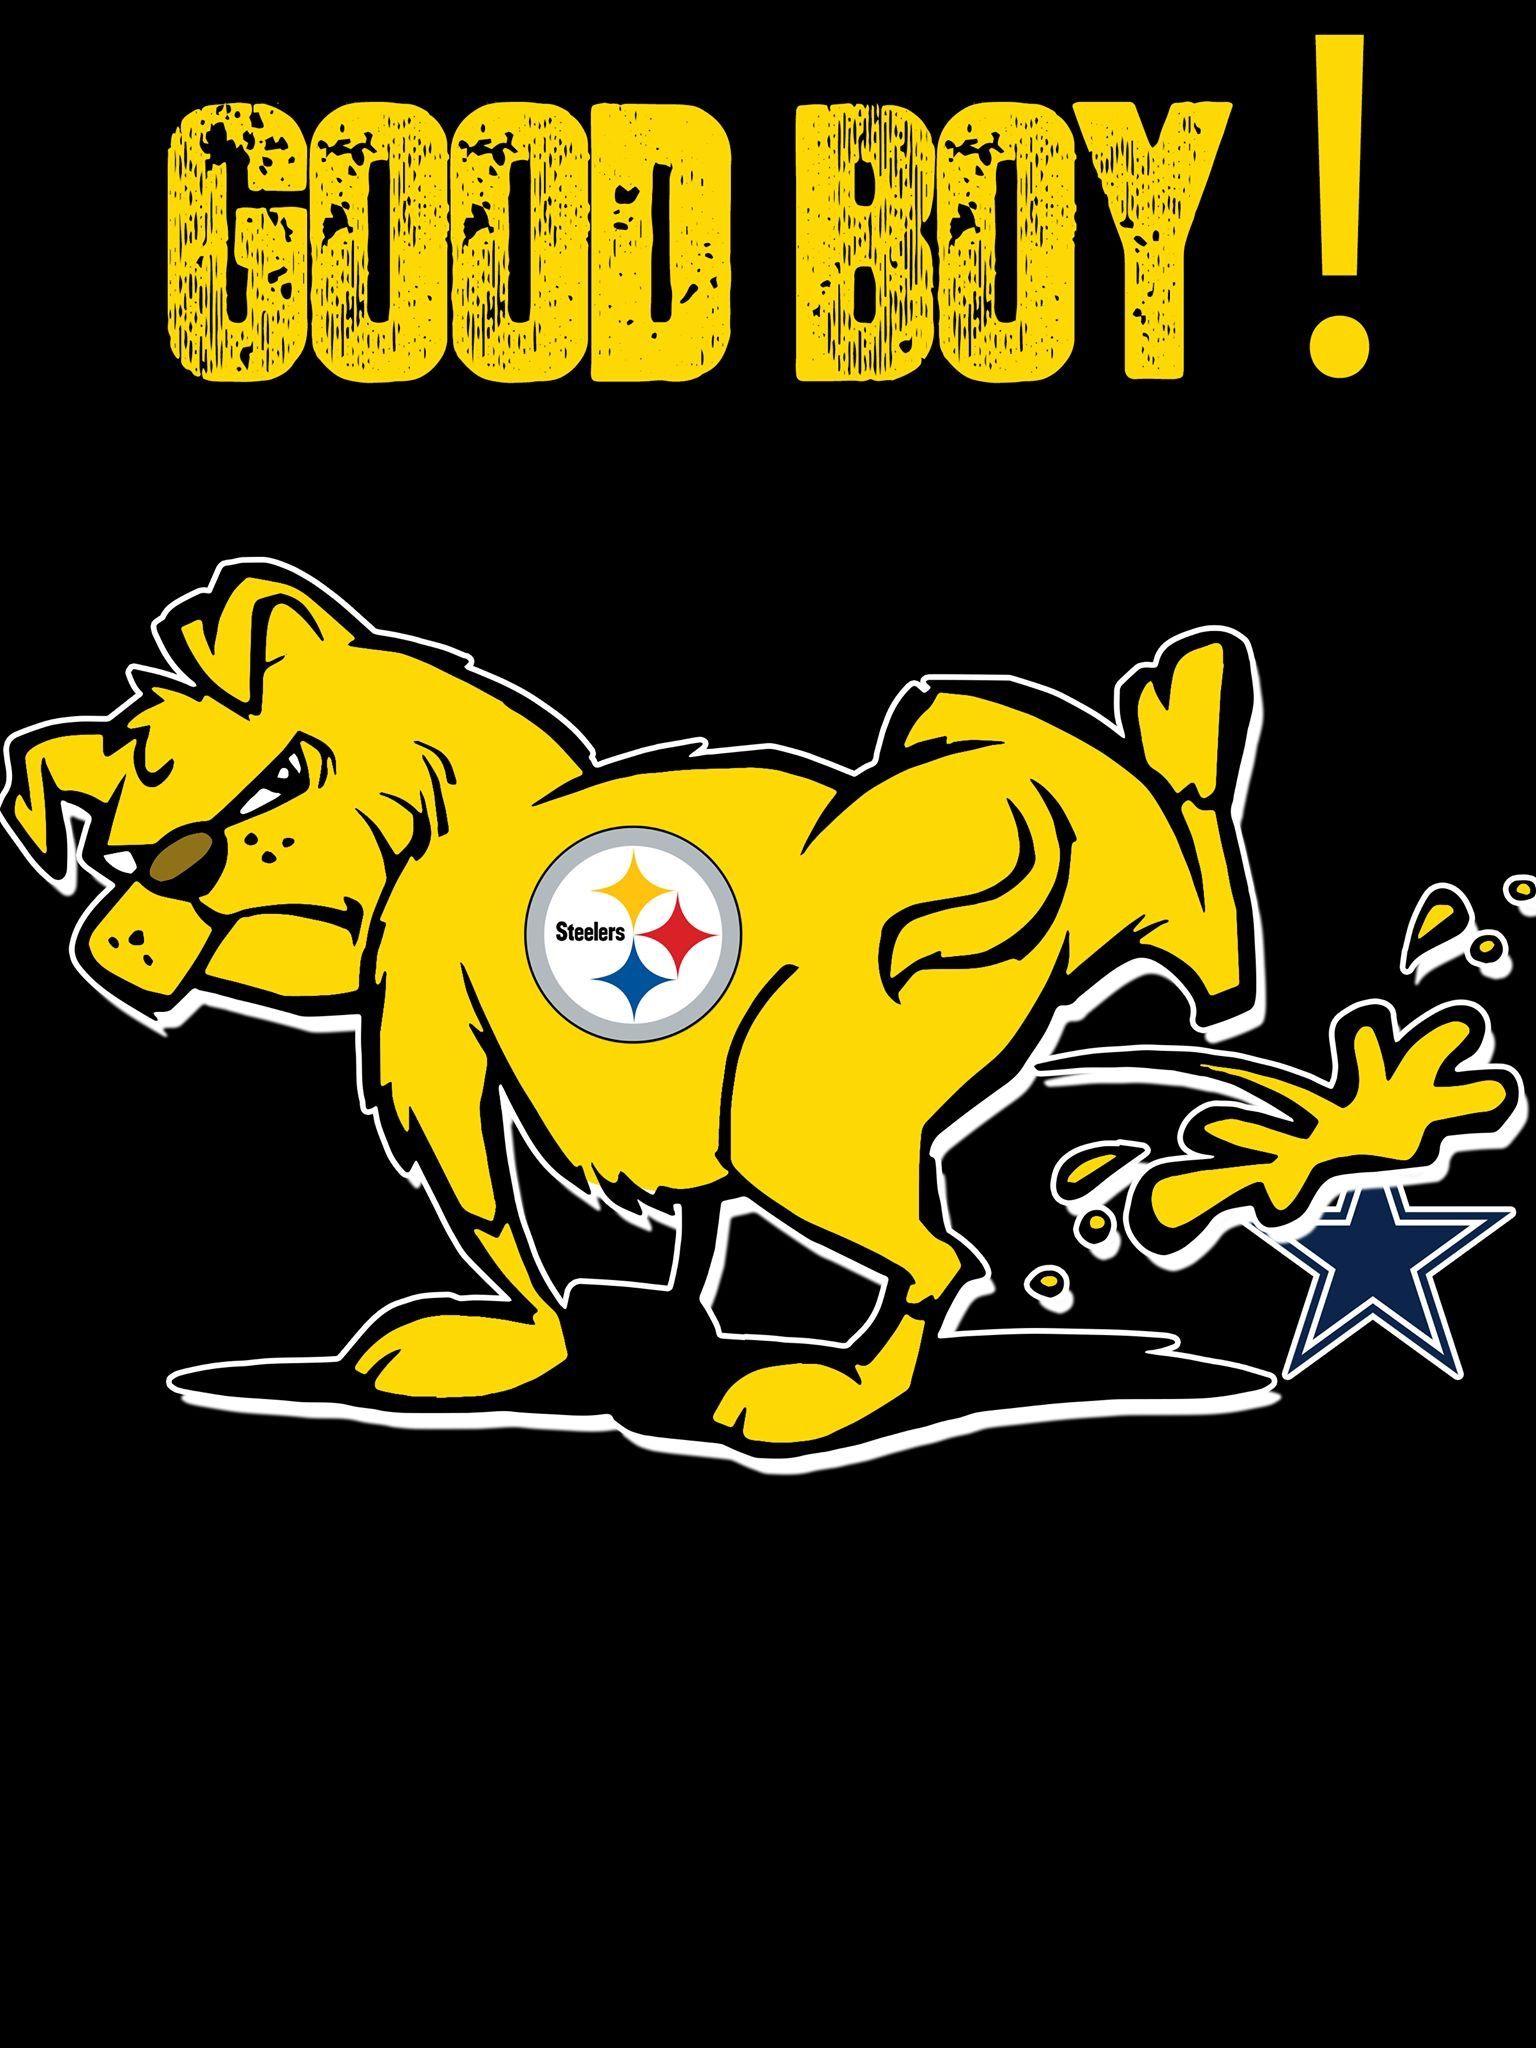 Let's Go! Pittsburgh Steelers! Pittsburgh steelers